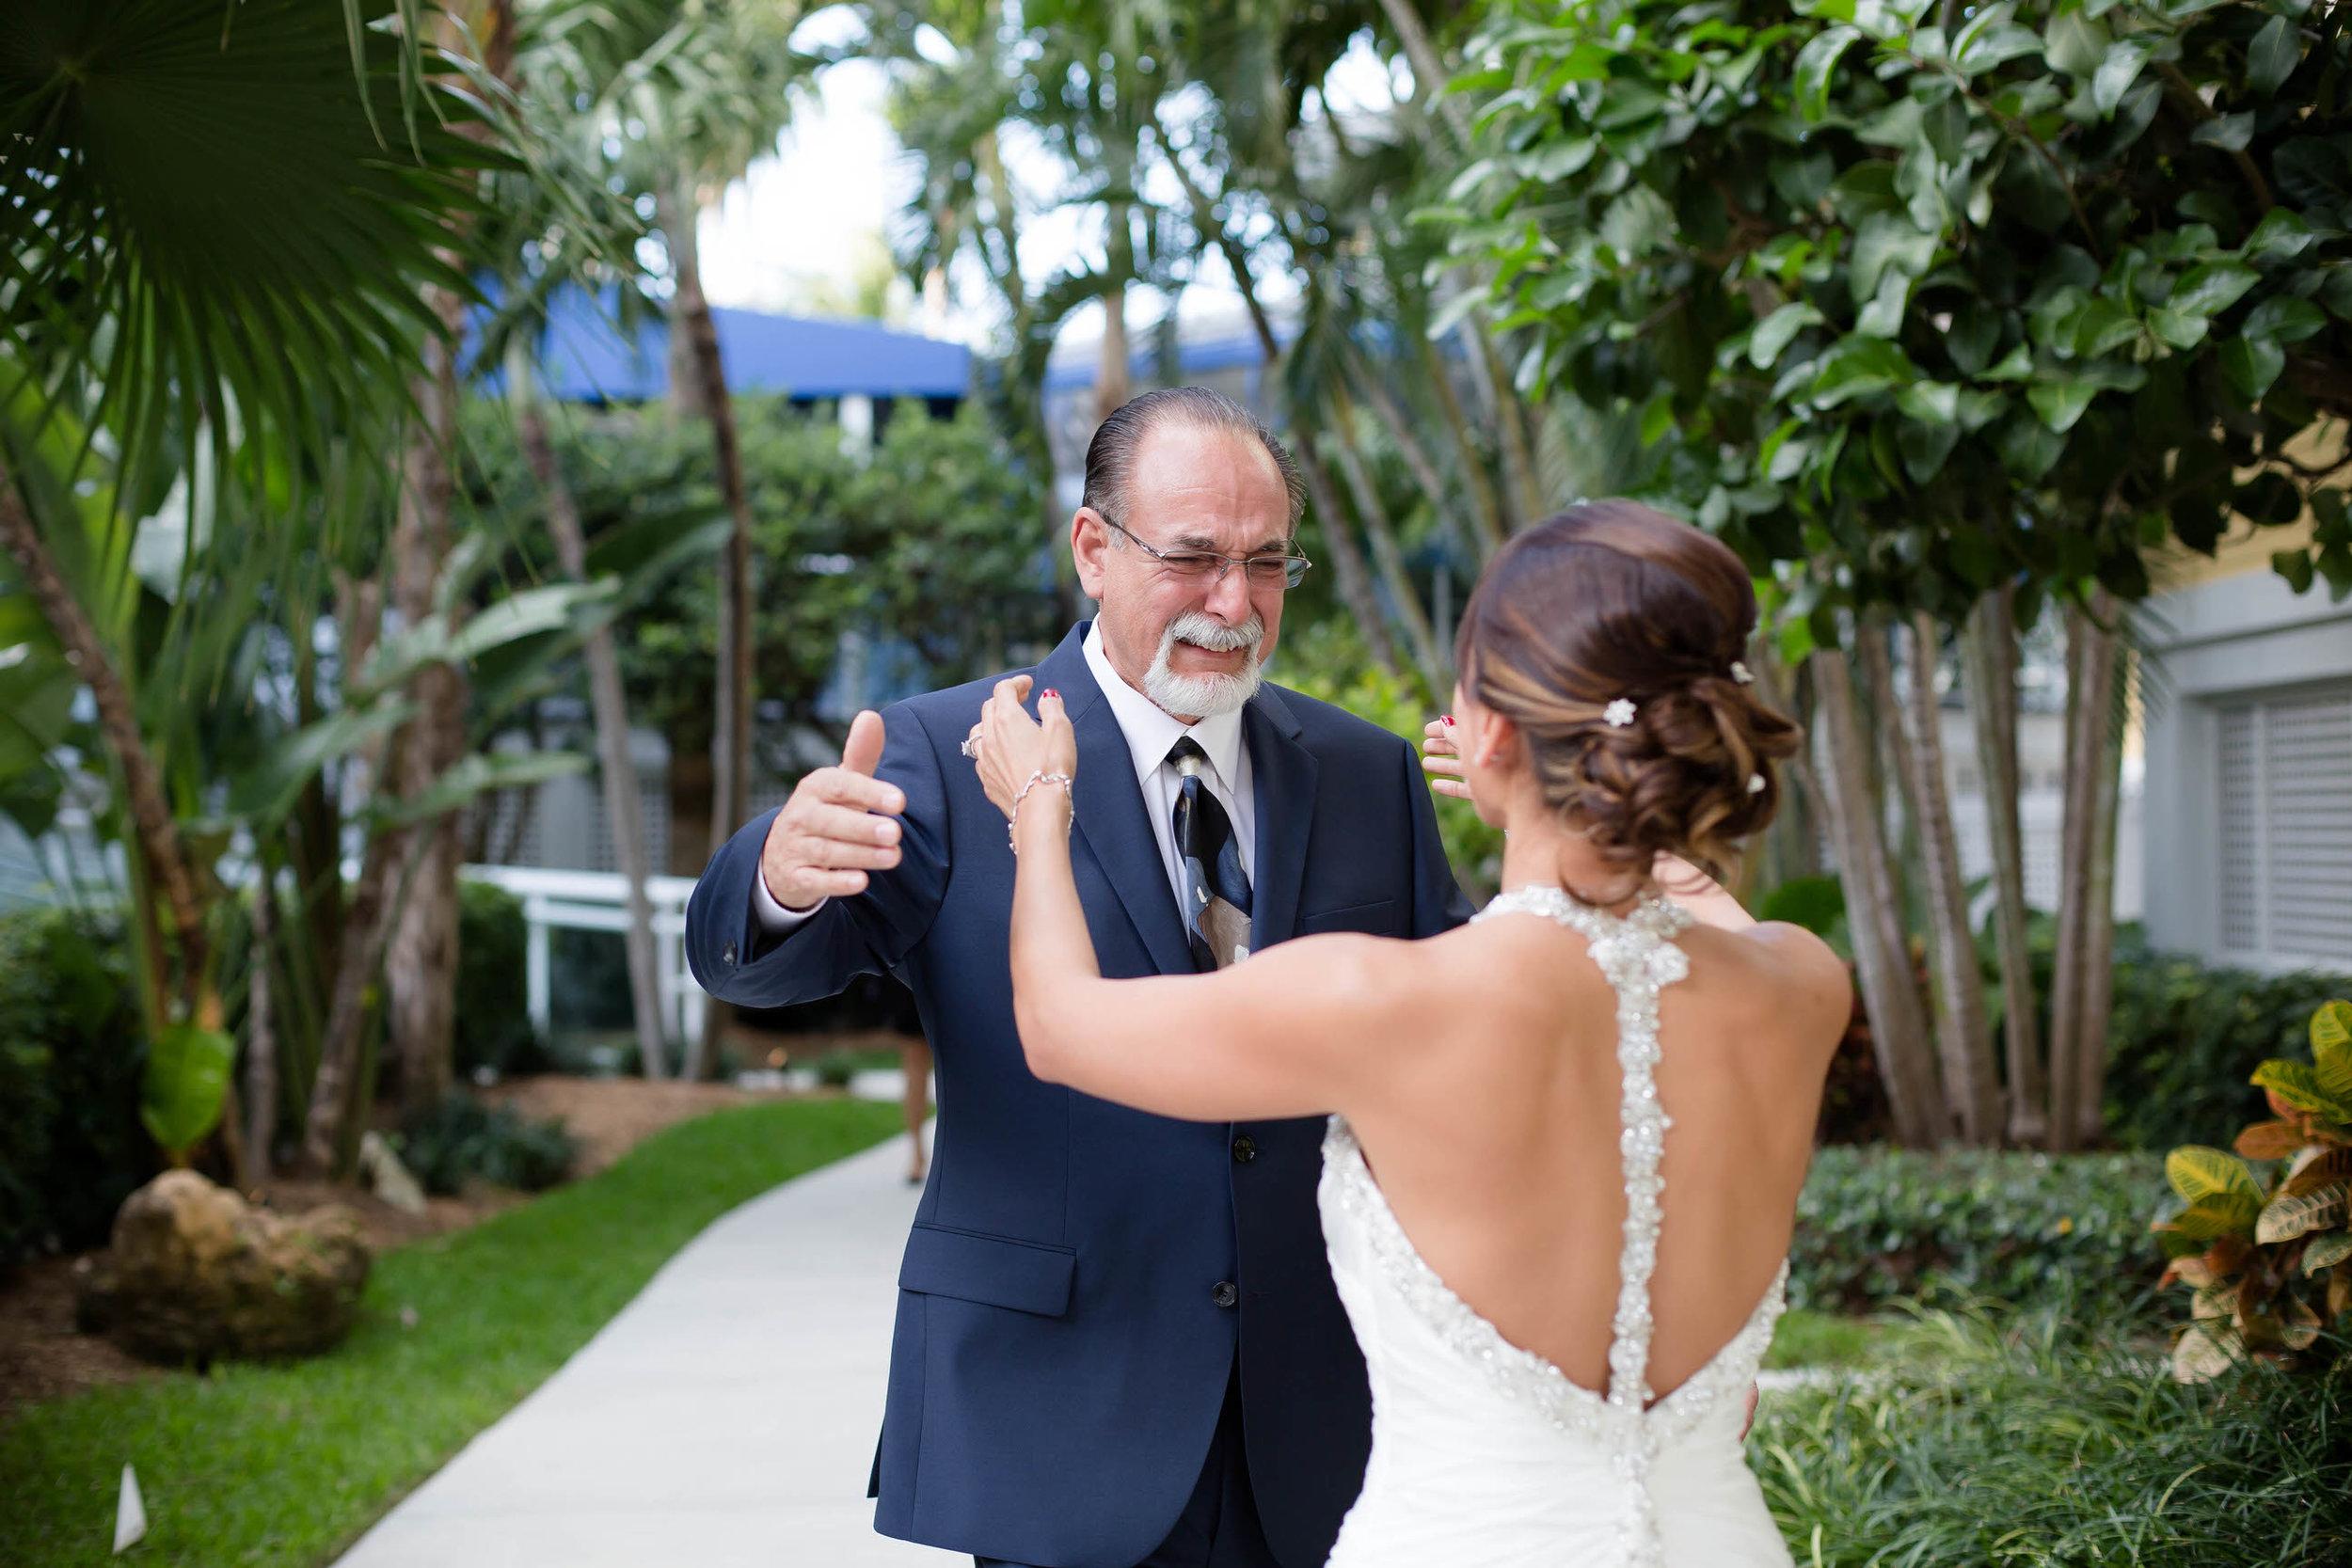 dad_first_look_bride_key_west_wedding_tiny_house_photo.jpg